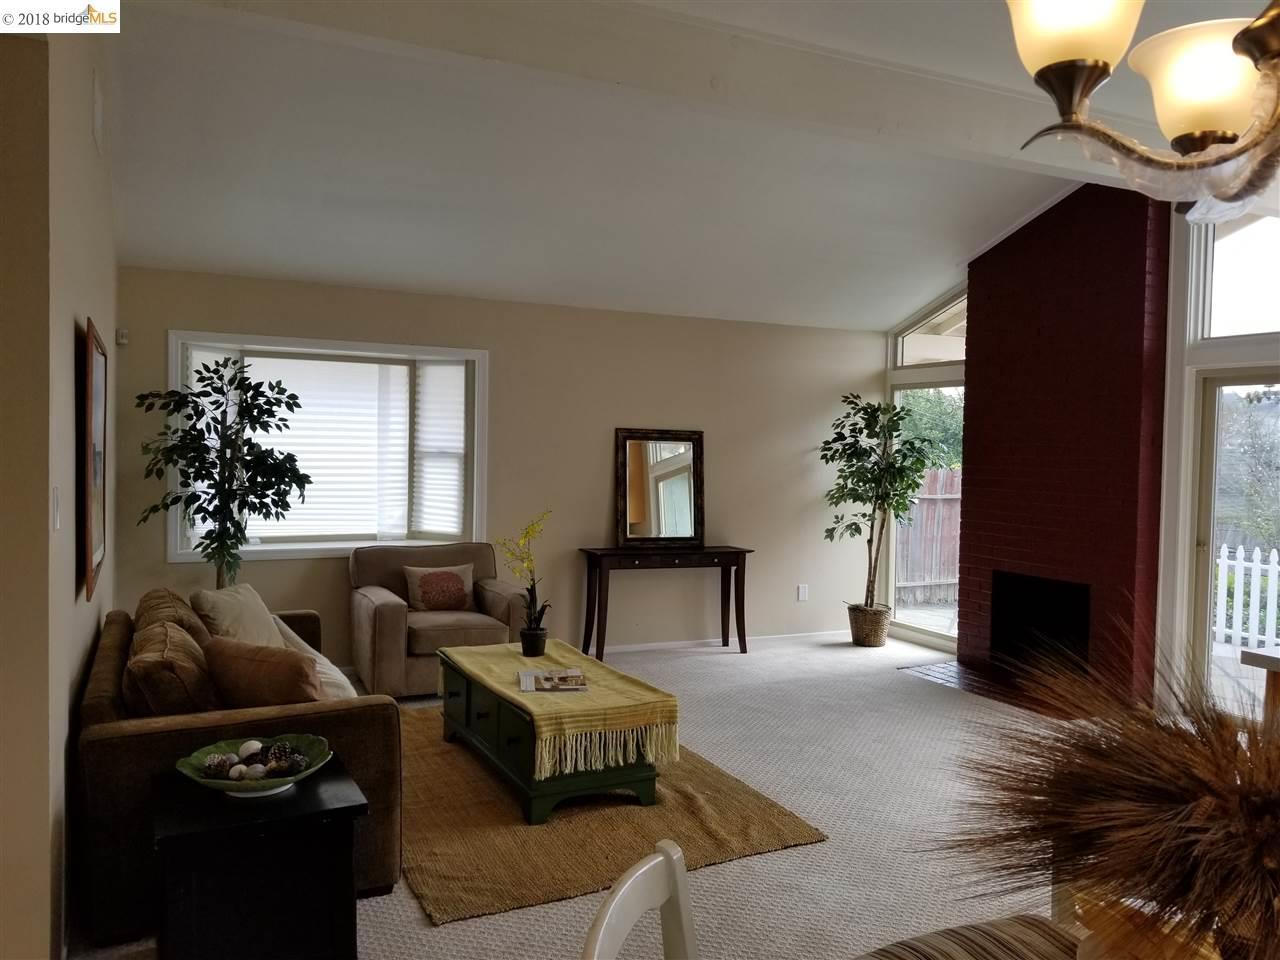 Additional photo for property listing at 2554 Duke Avenue 2554 Duke Avenue Richmond, Калифорния 94806 Соединенные Штаты